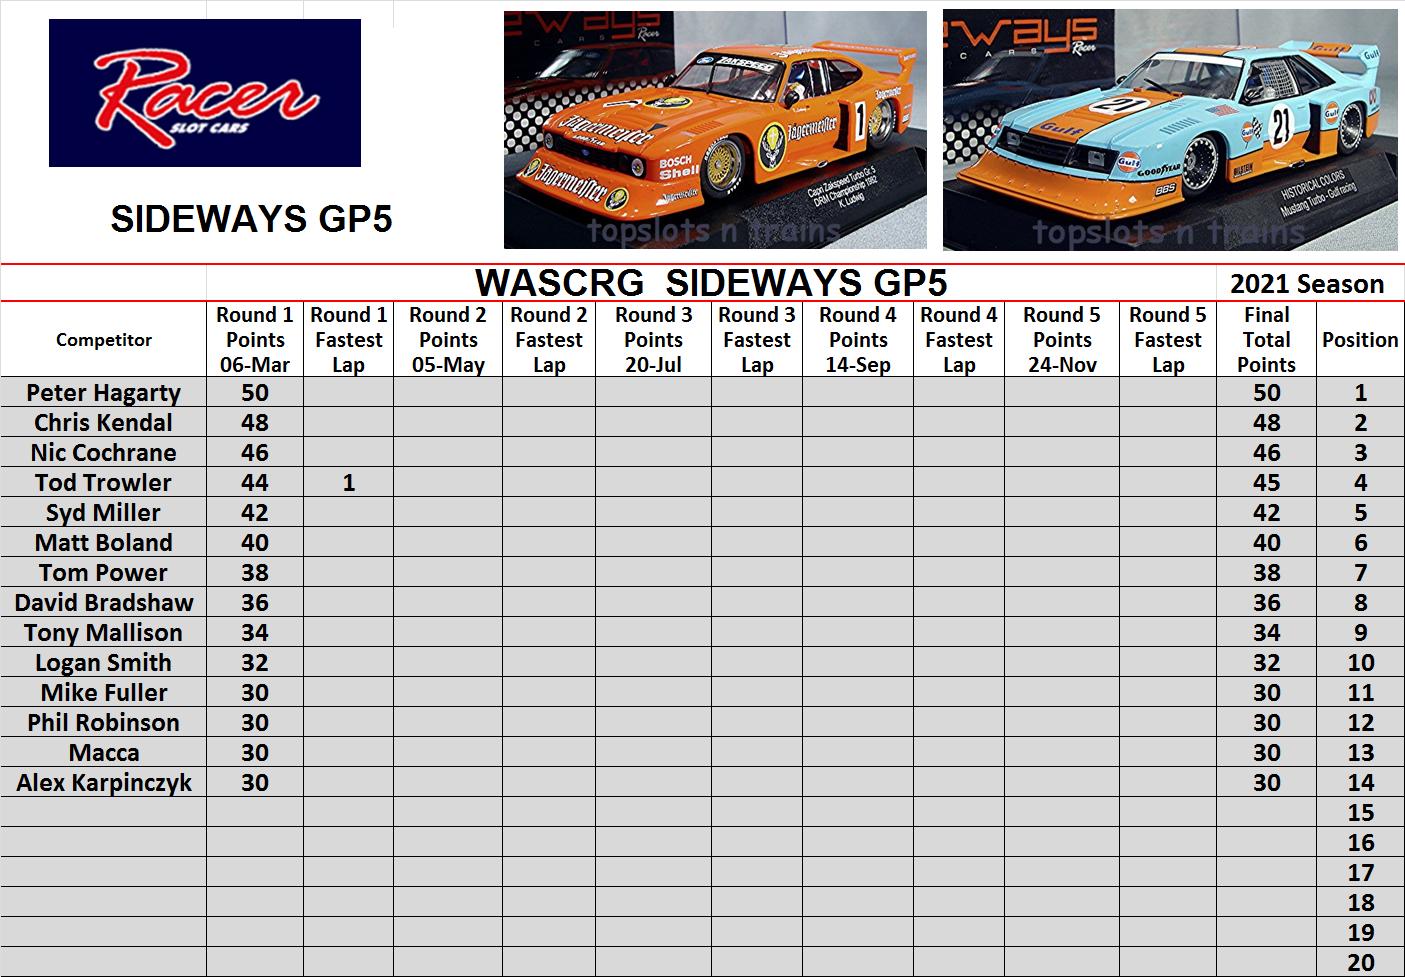 028: Sideways Group 5 2021 | Wa Slot Car Racing Group